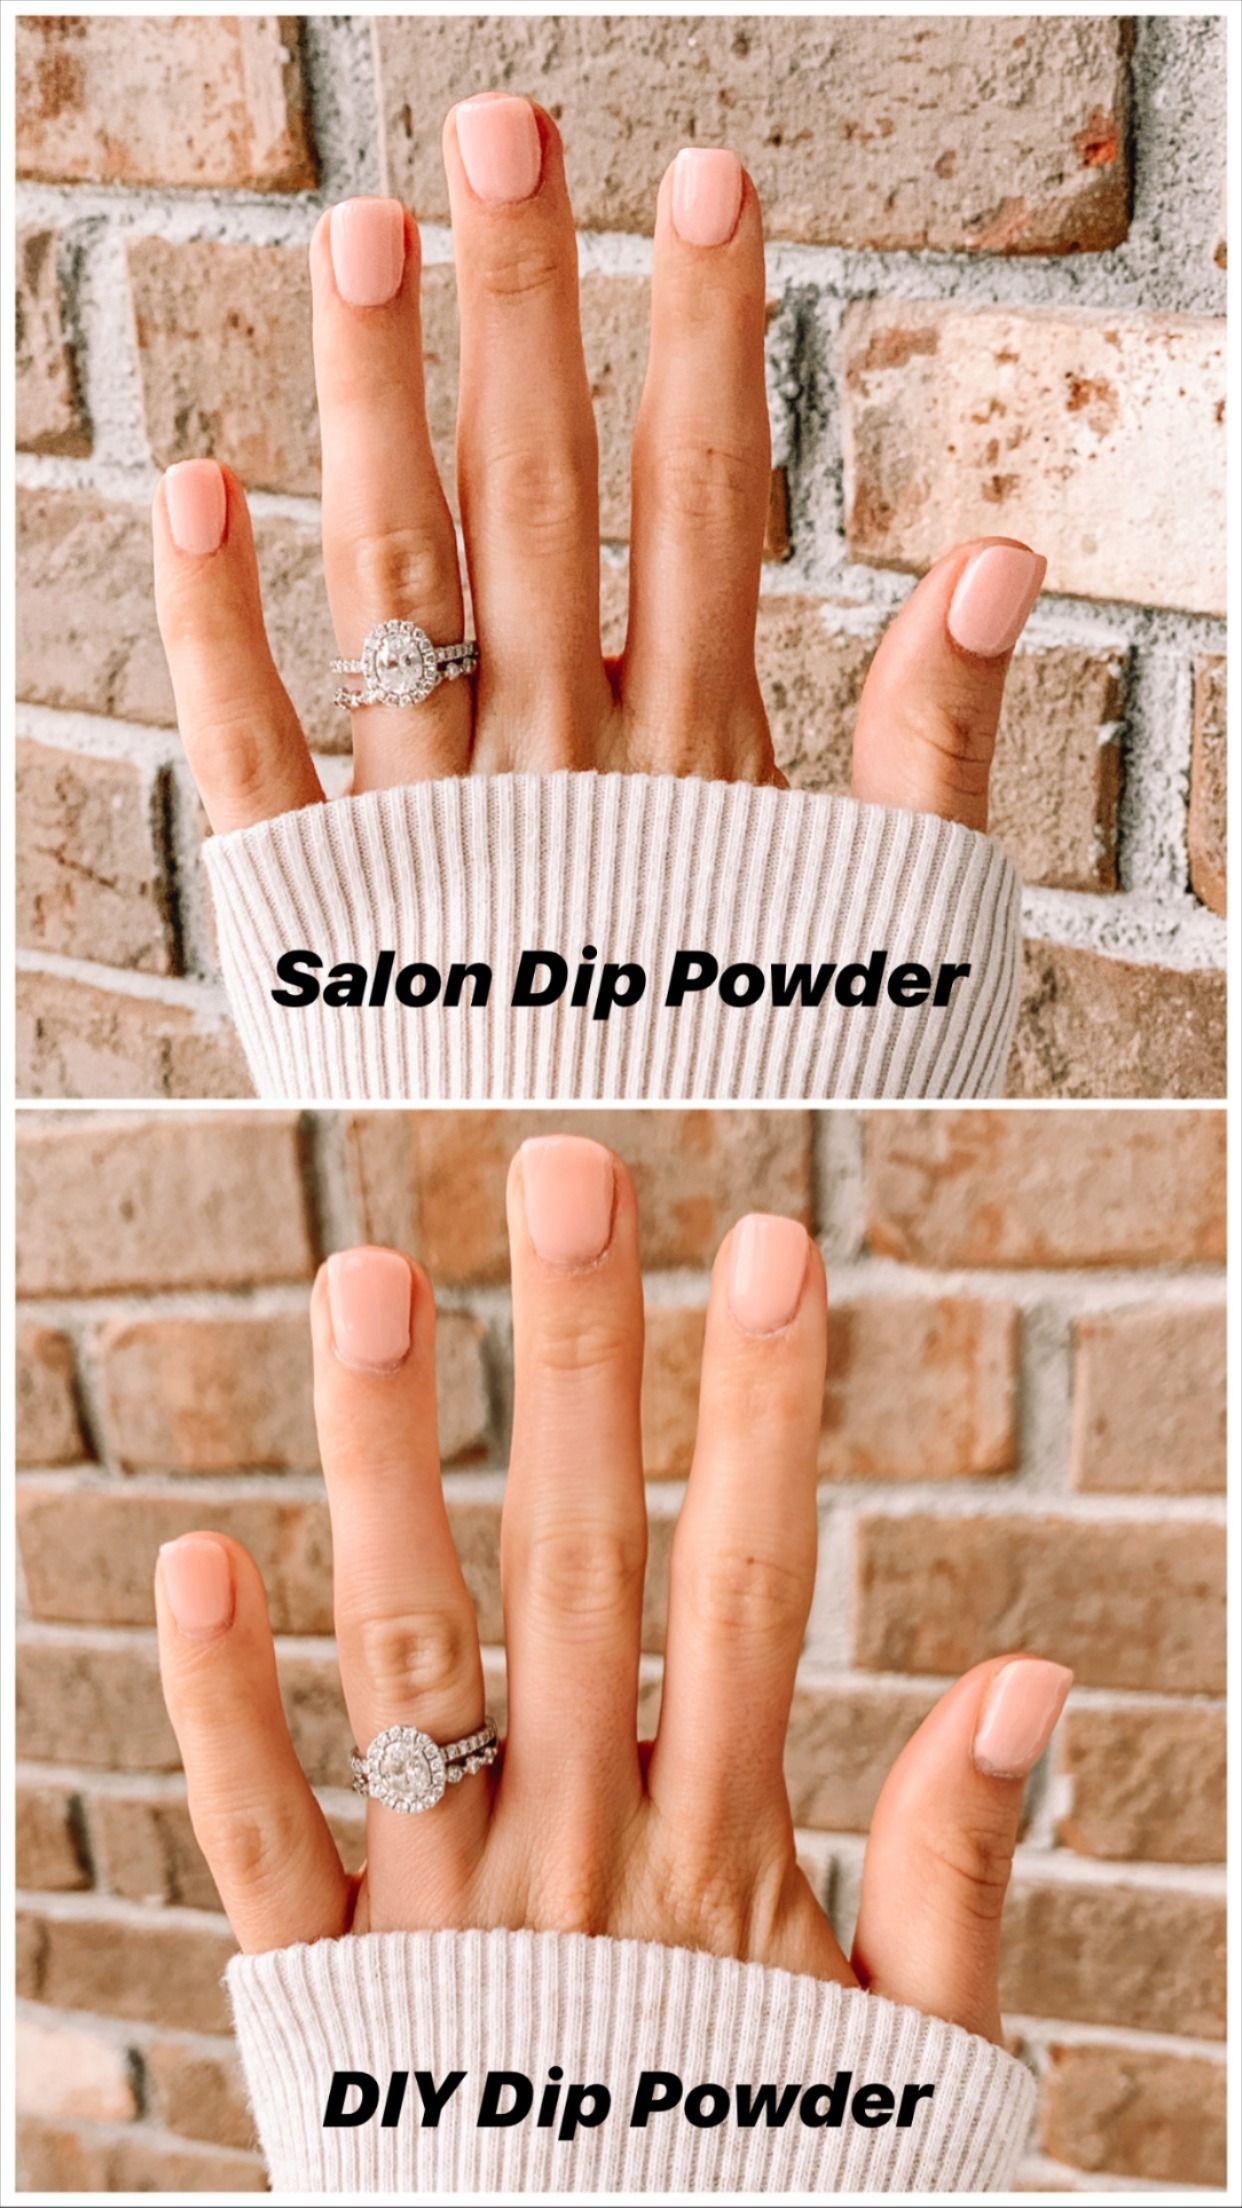 Diy dip powder nails in 2020 dip powder nails gel